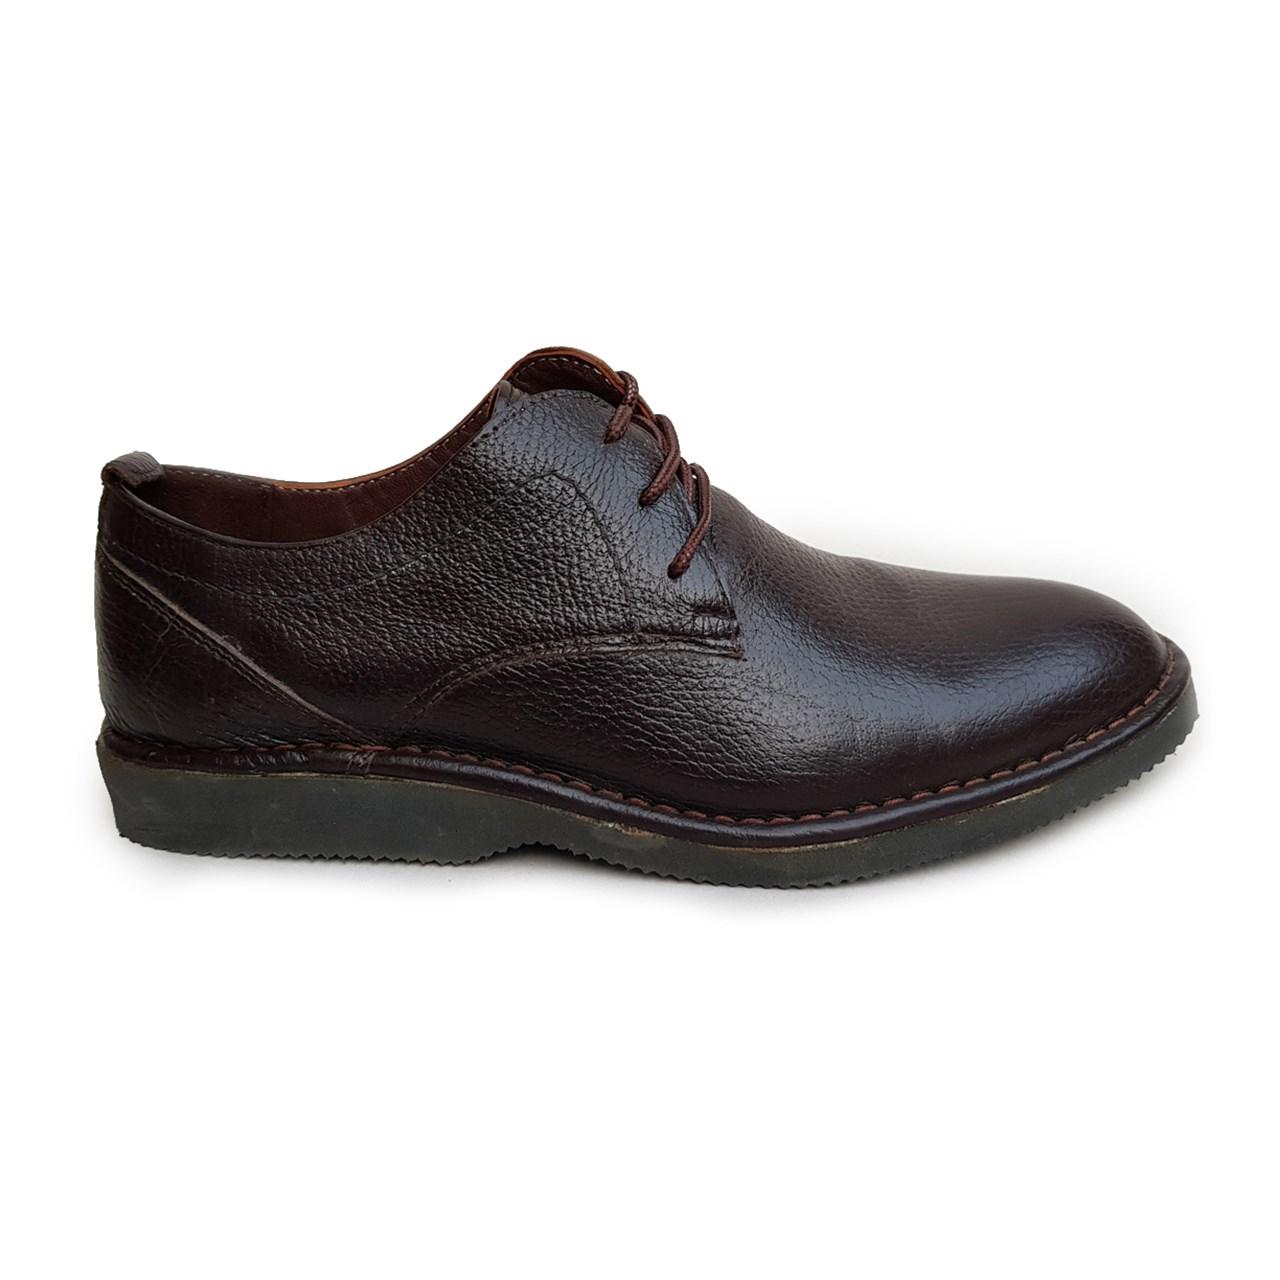 قیمت کفش مردانه چرم طبیعی دیاکو مدلMSL-ARAD-BROWN